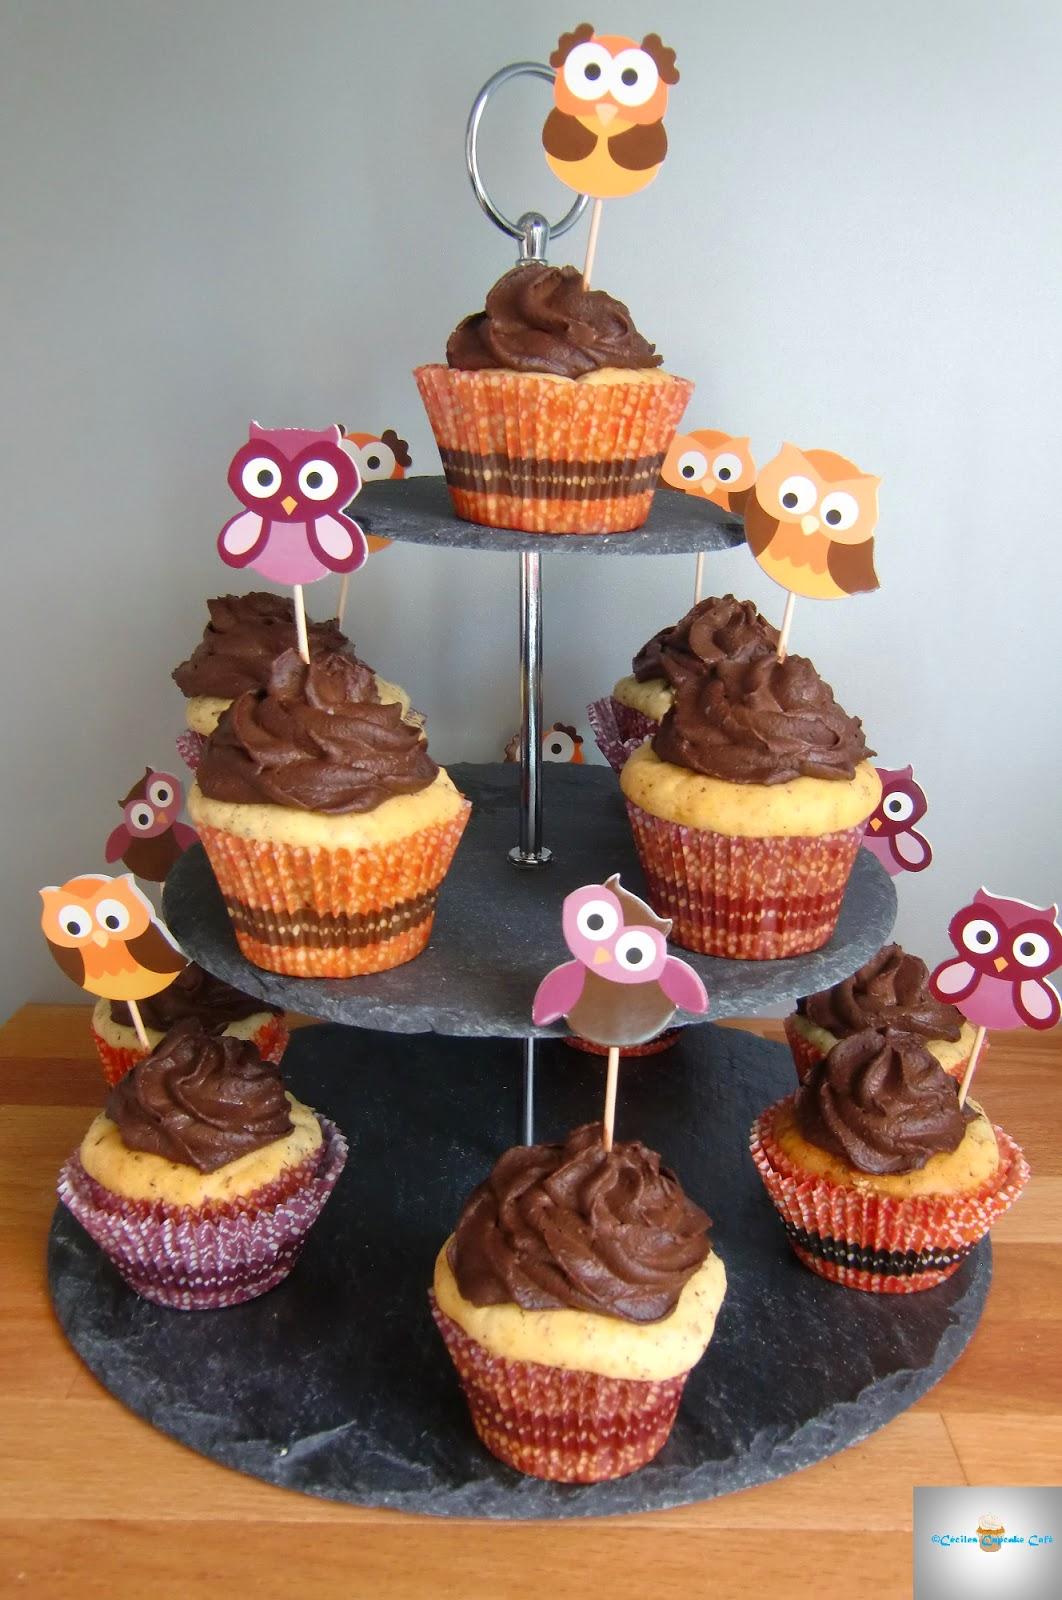 http://cecilecupcakecafe.blogspot.de/2014/09/nuss-cupcakes-mit-dunklem-schokotopping.html